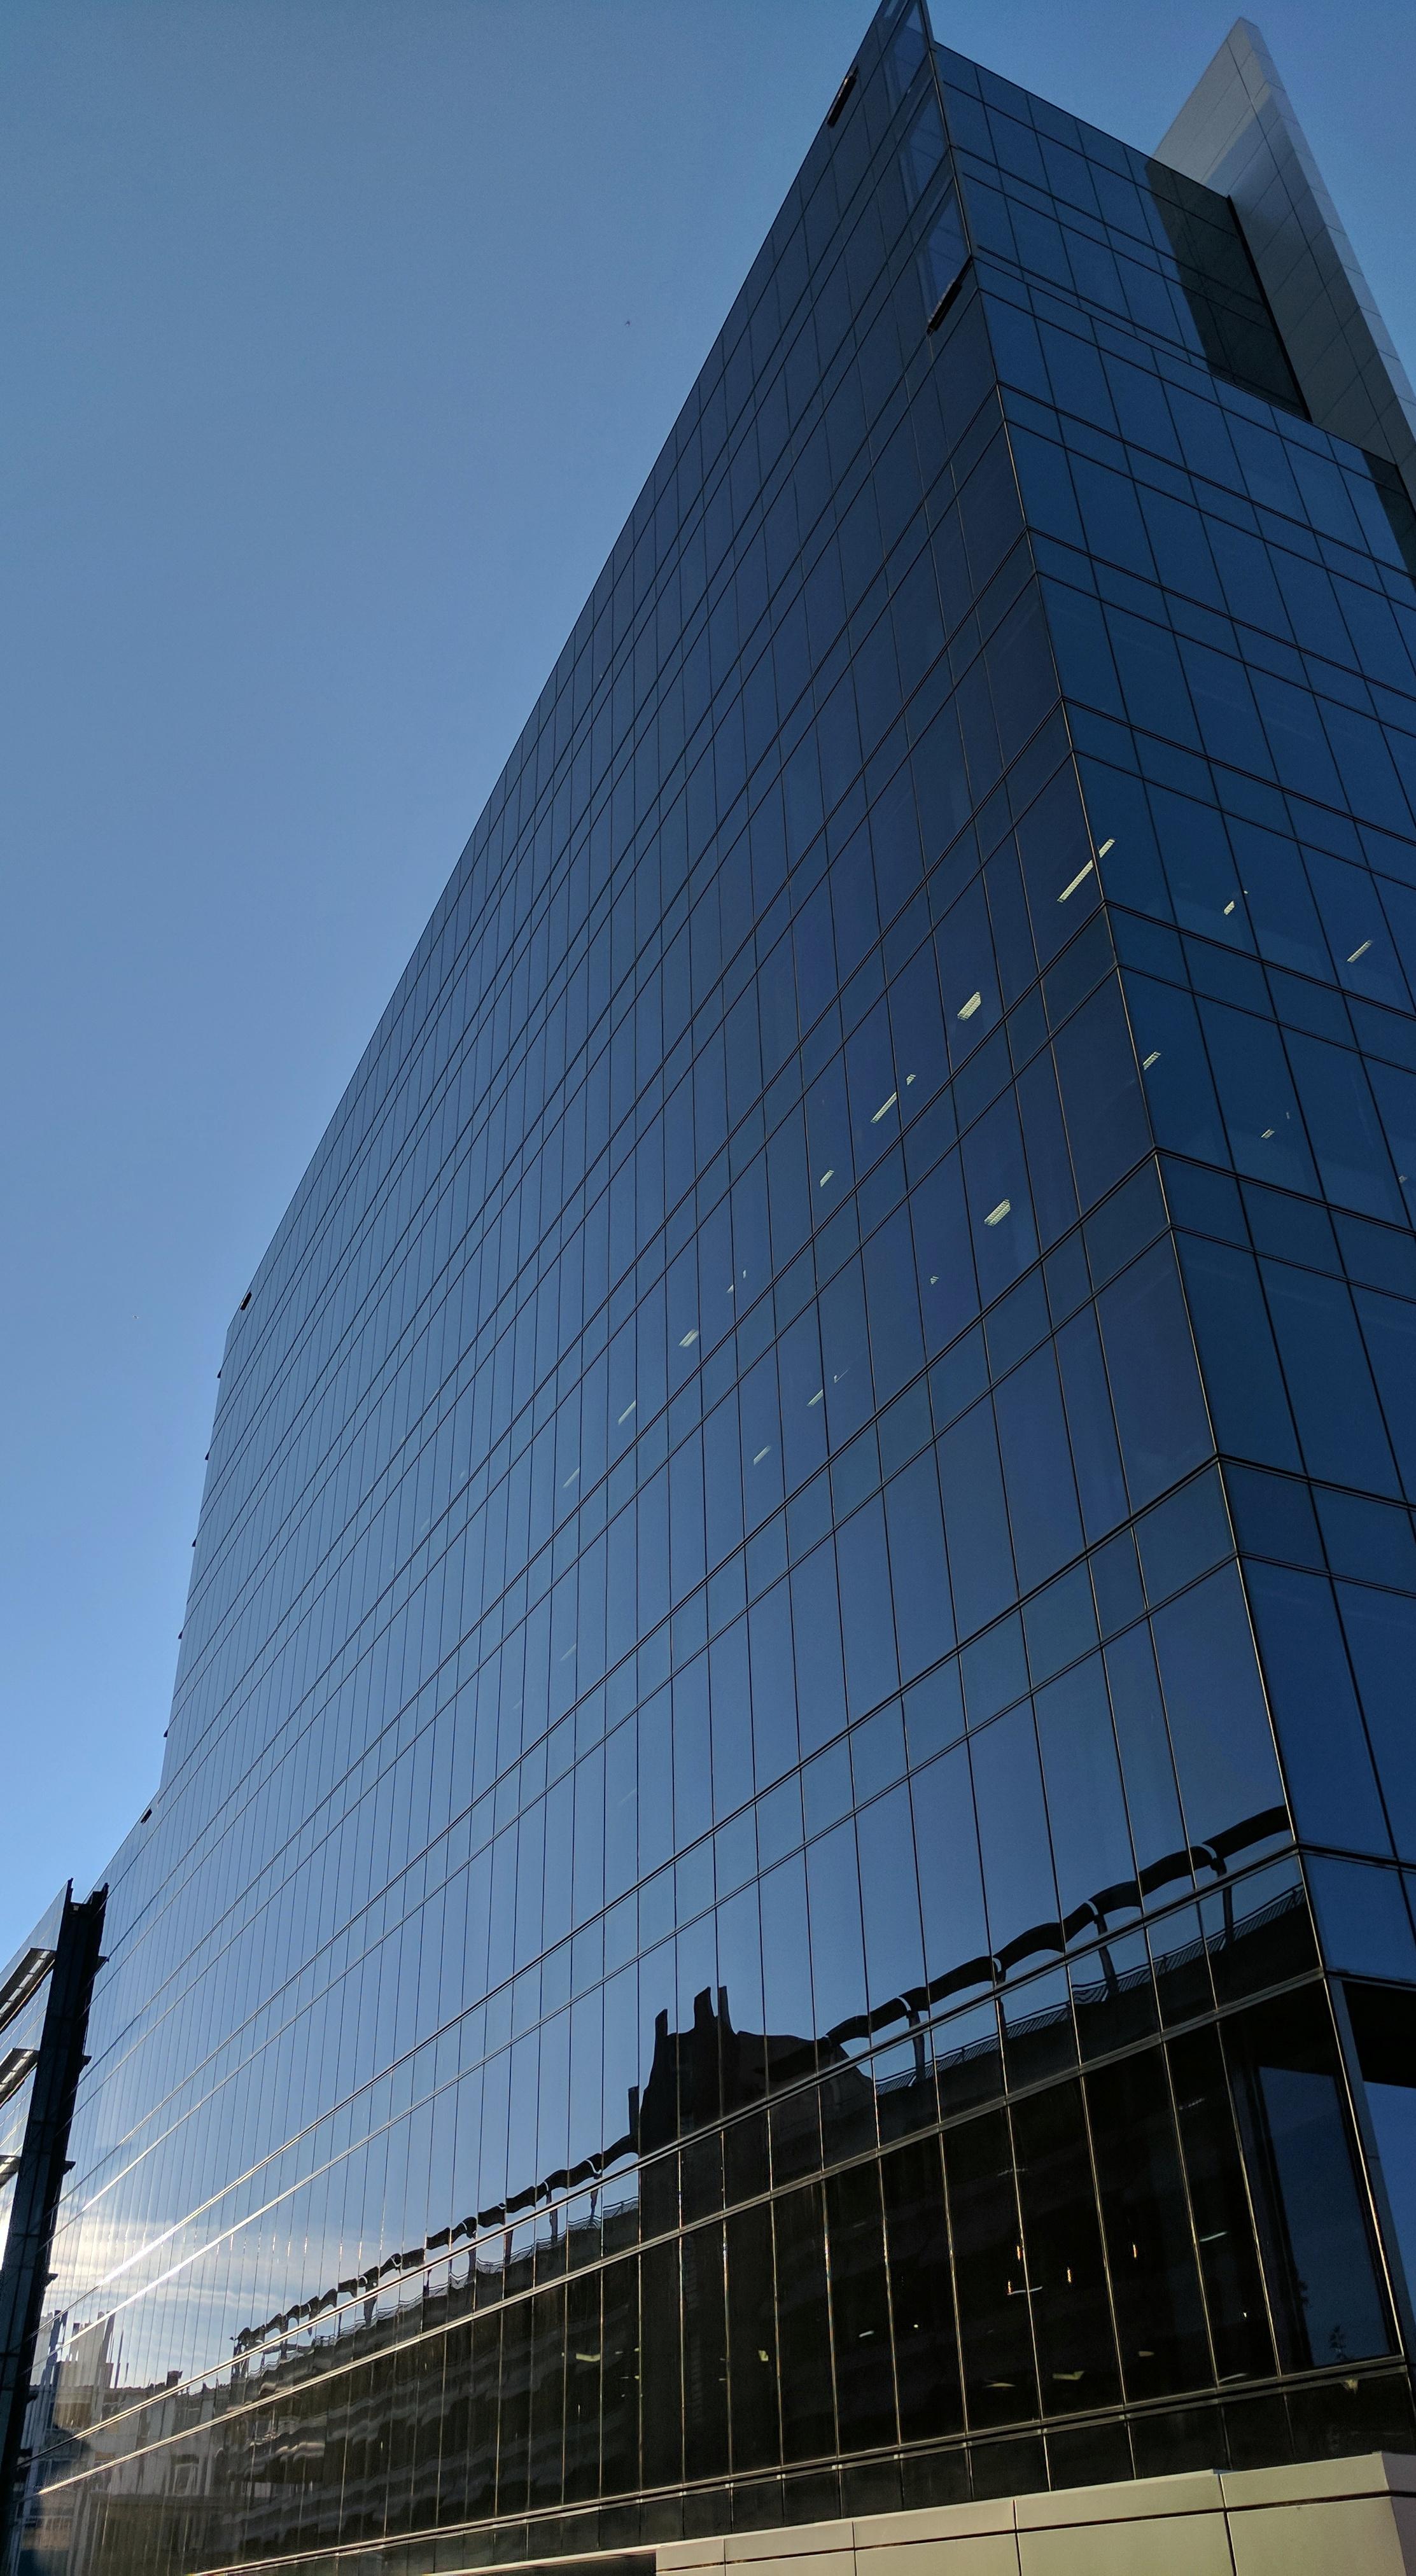 Ernst & Young building, Canberra (Australia)